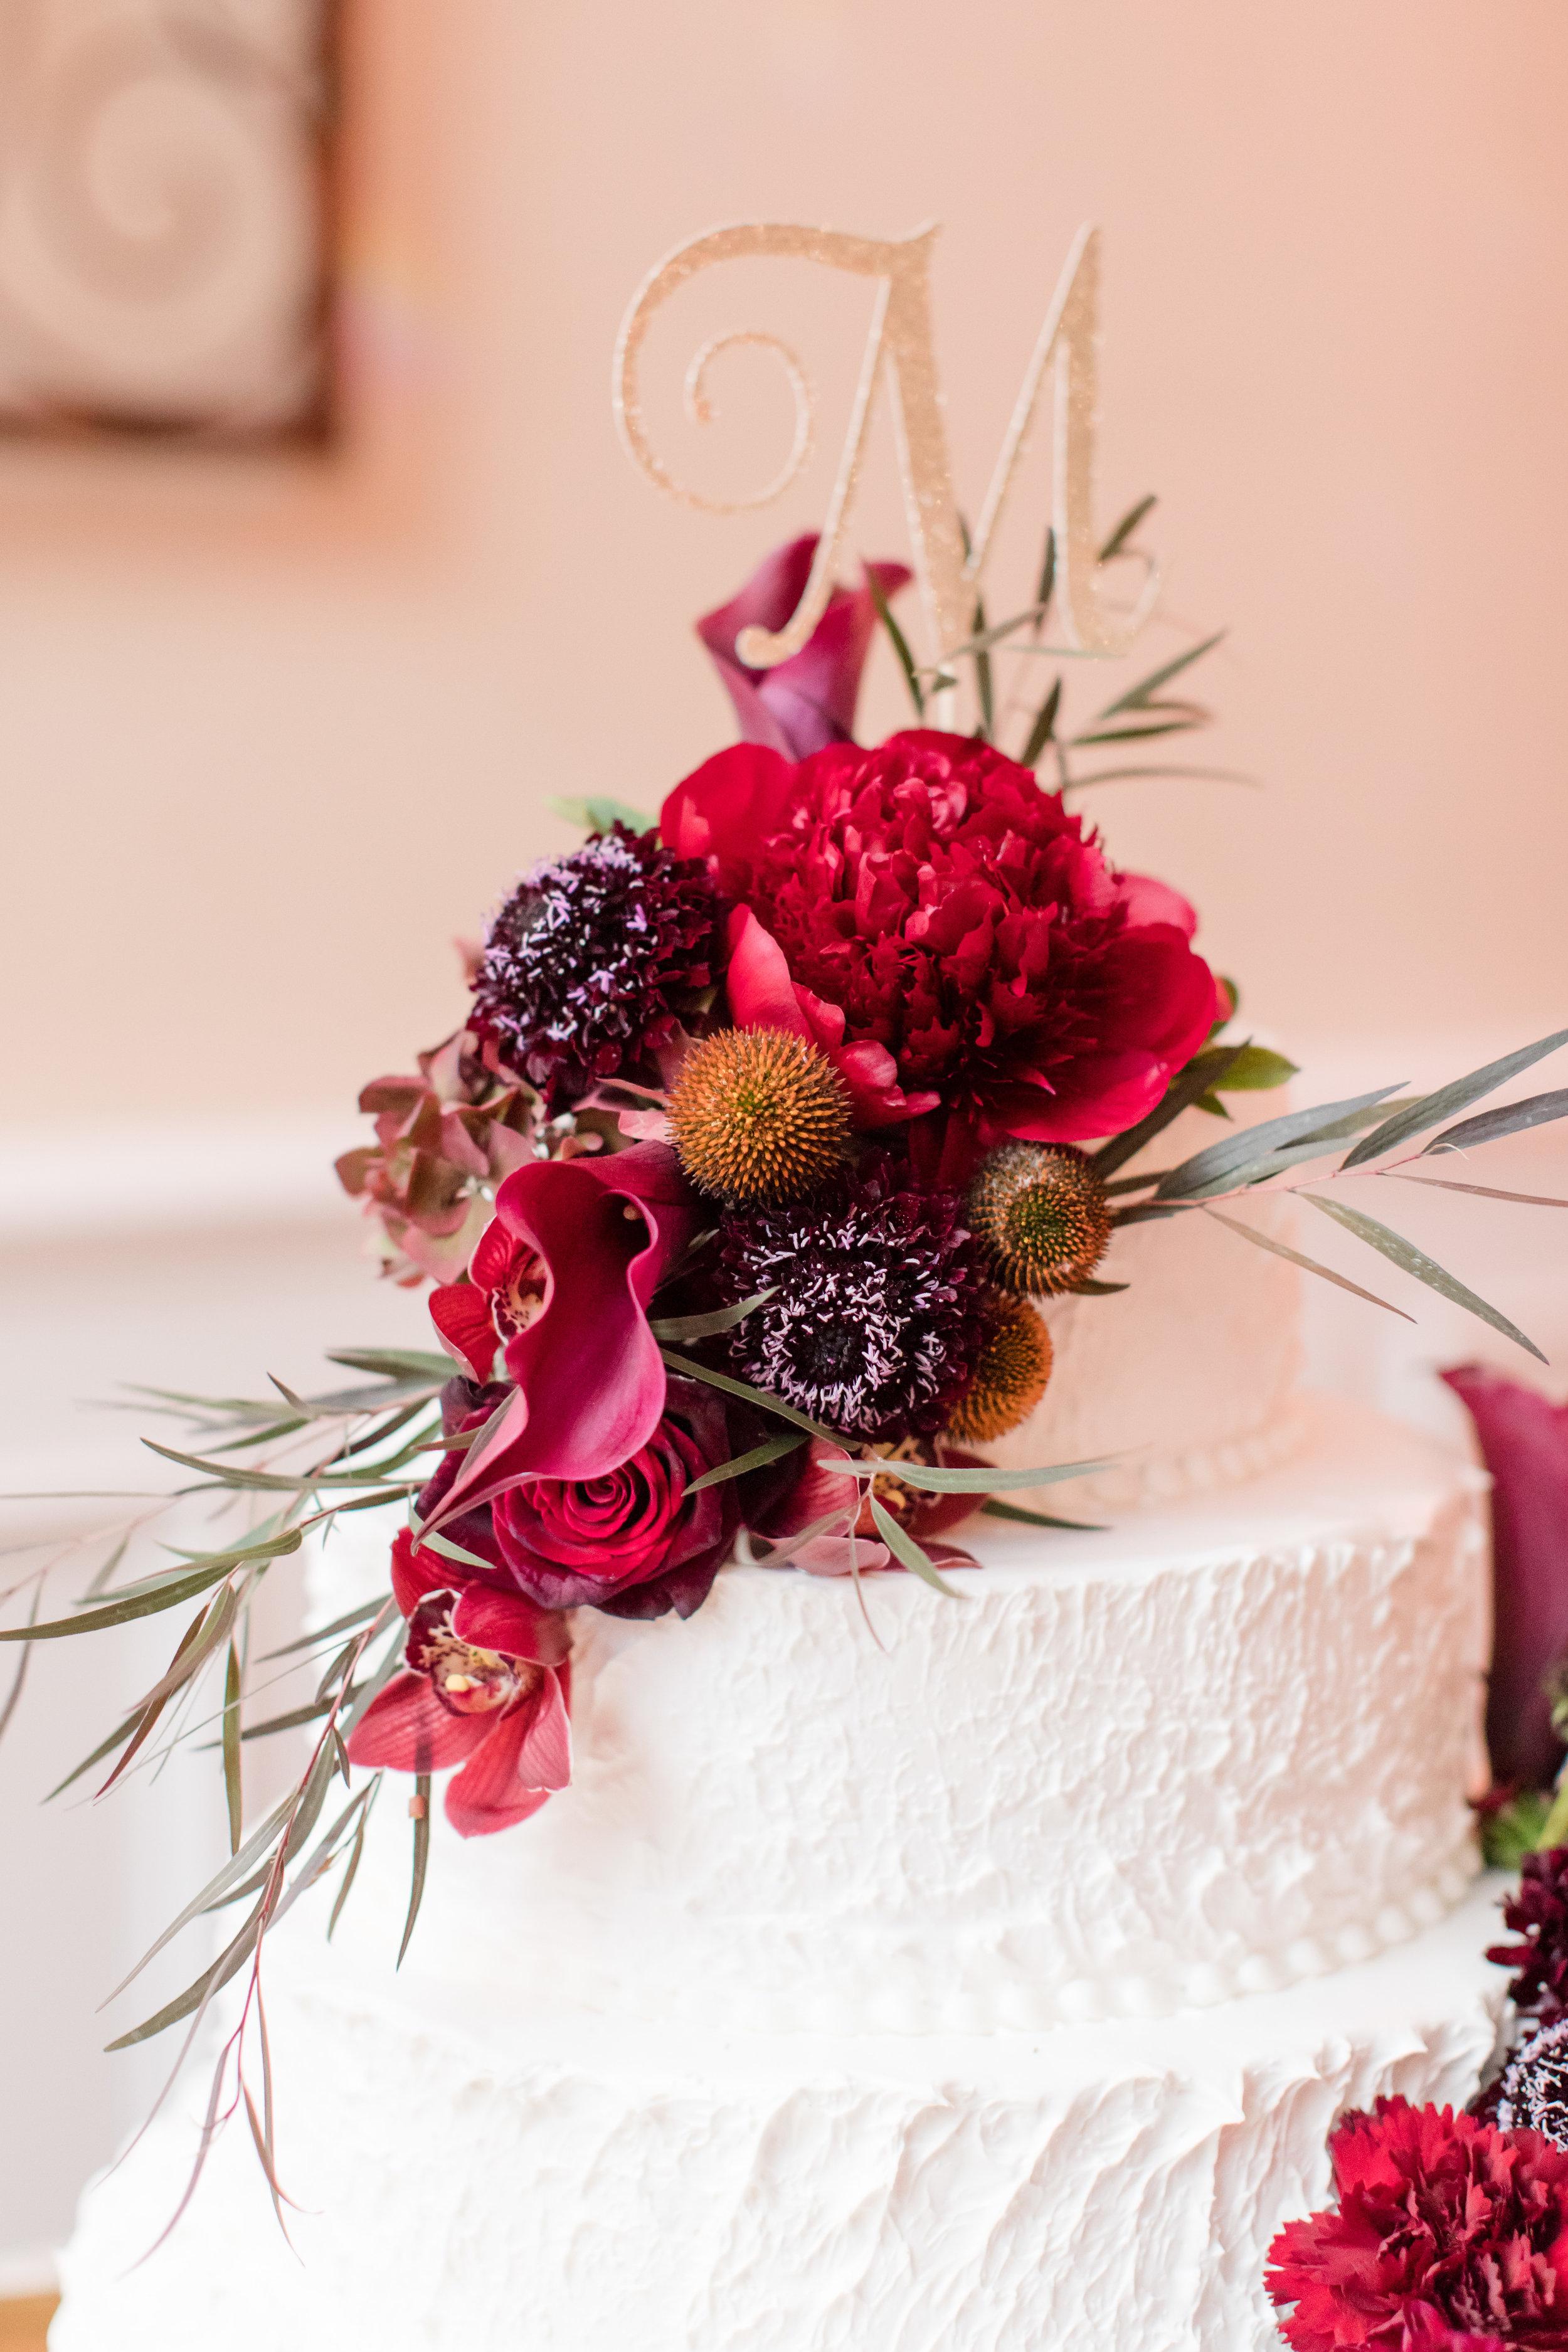 White wedding cake with fresh flower topper dark red flowers and gold glitter monogram